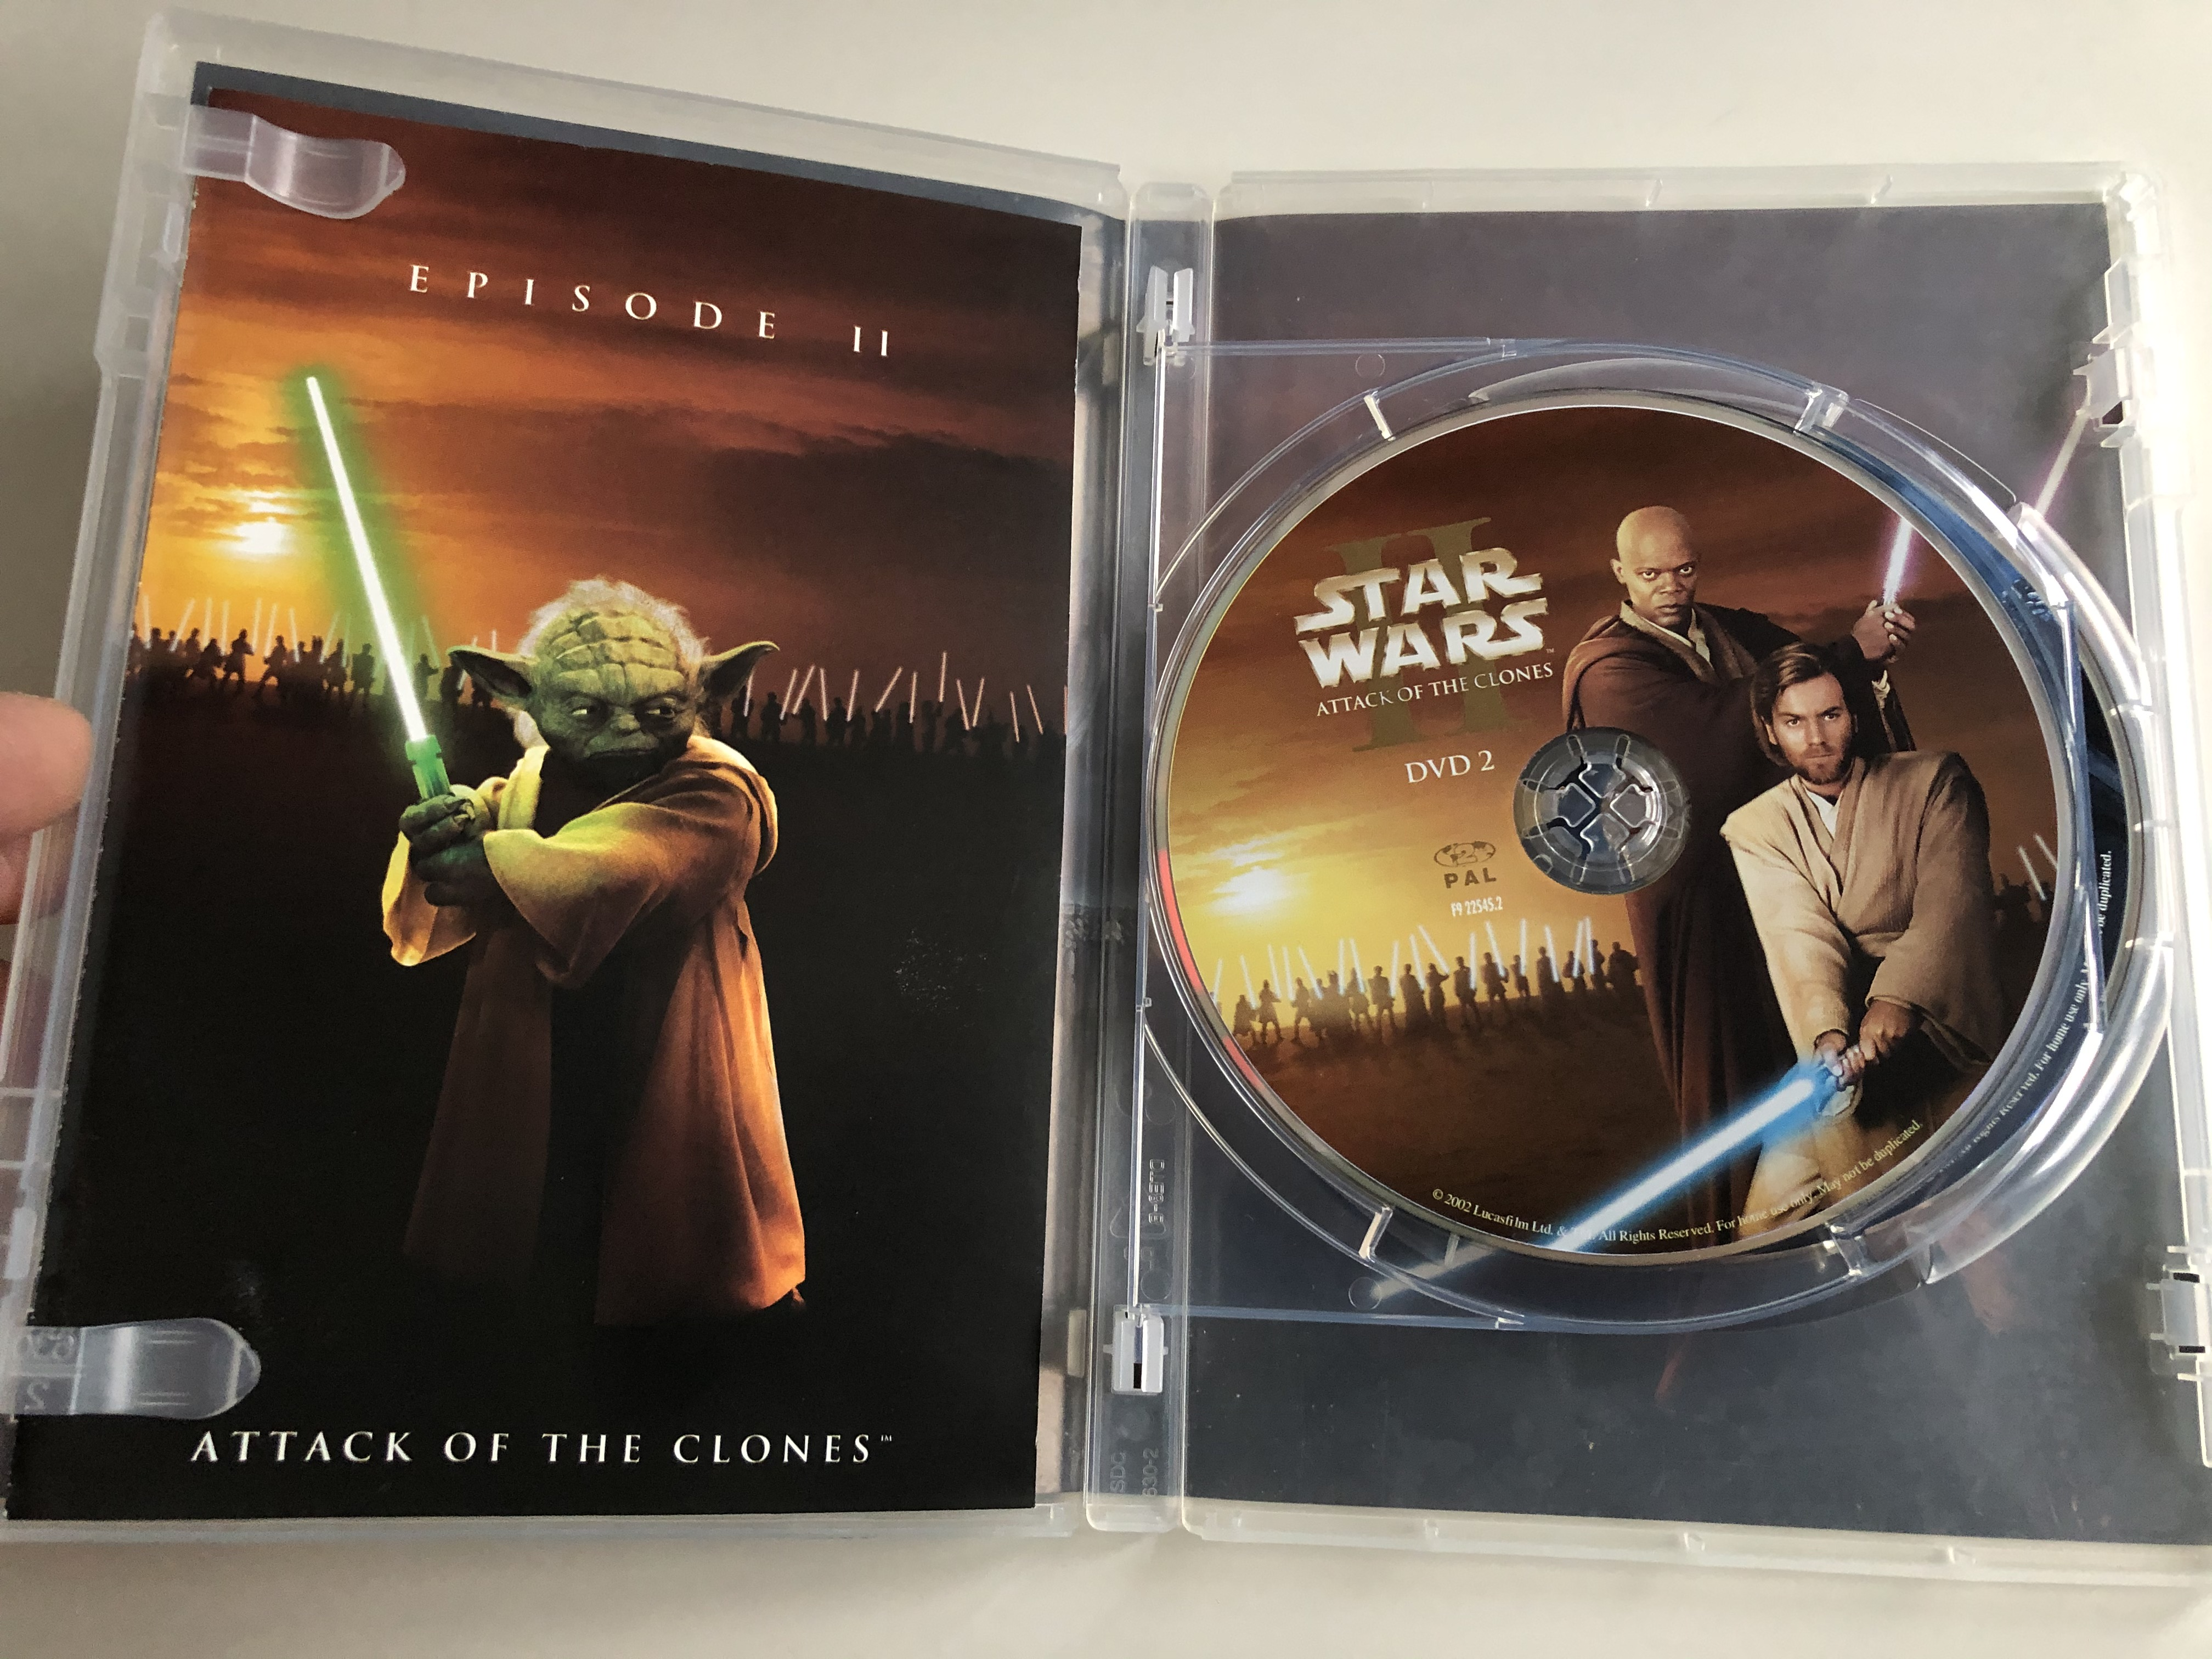 star-wars-ii-attack-of-the-clones-dvd-2002-a-kl-nok-t-mad-sa-2.jpg